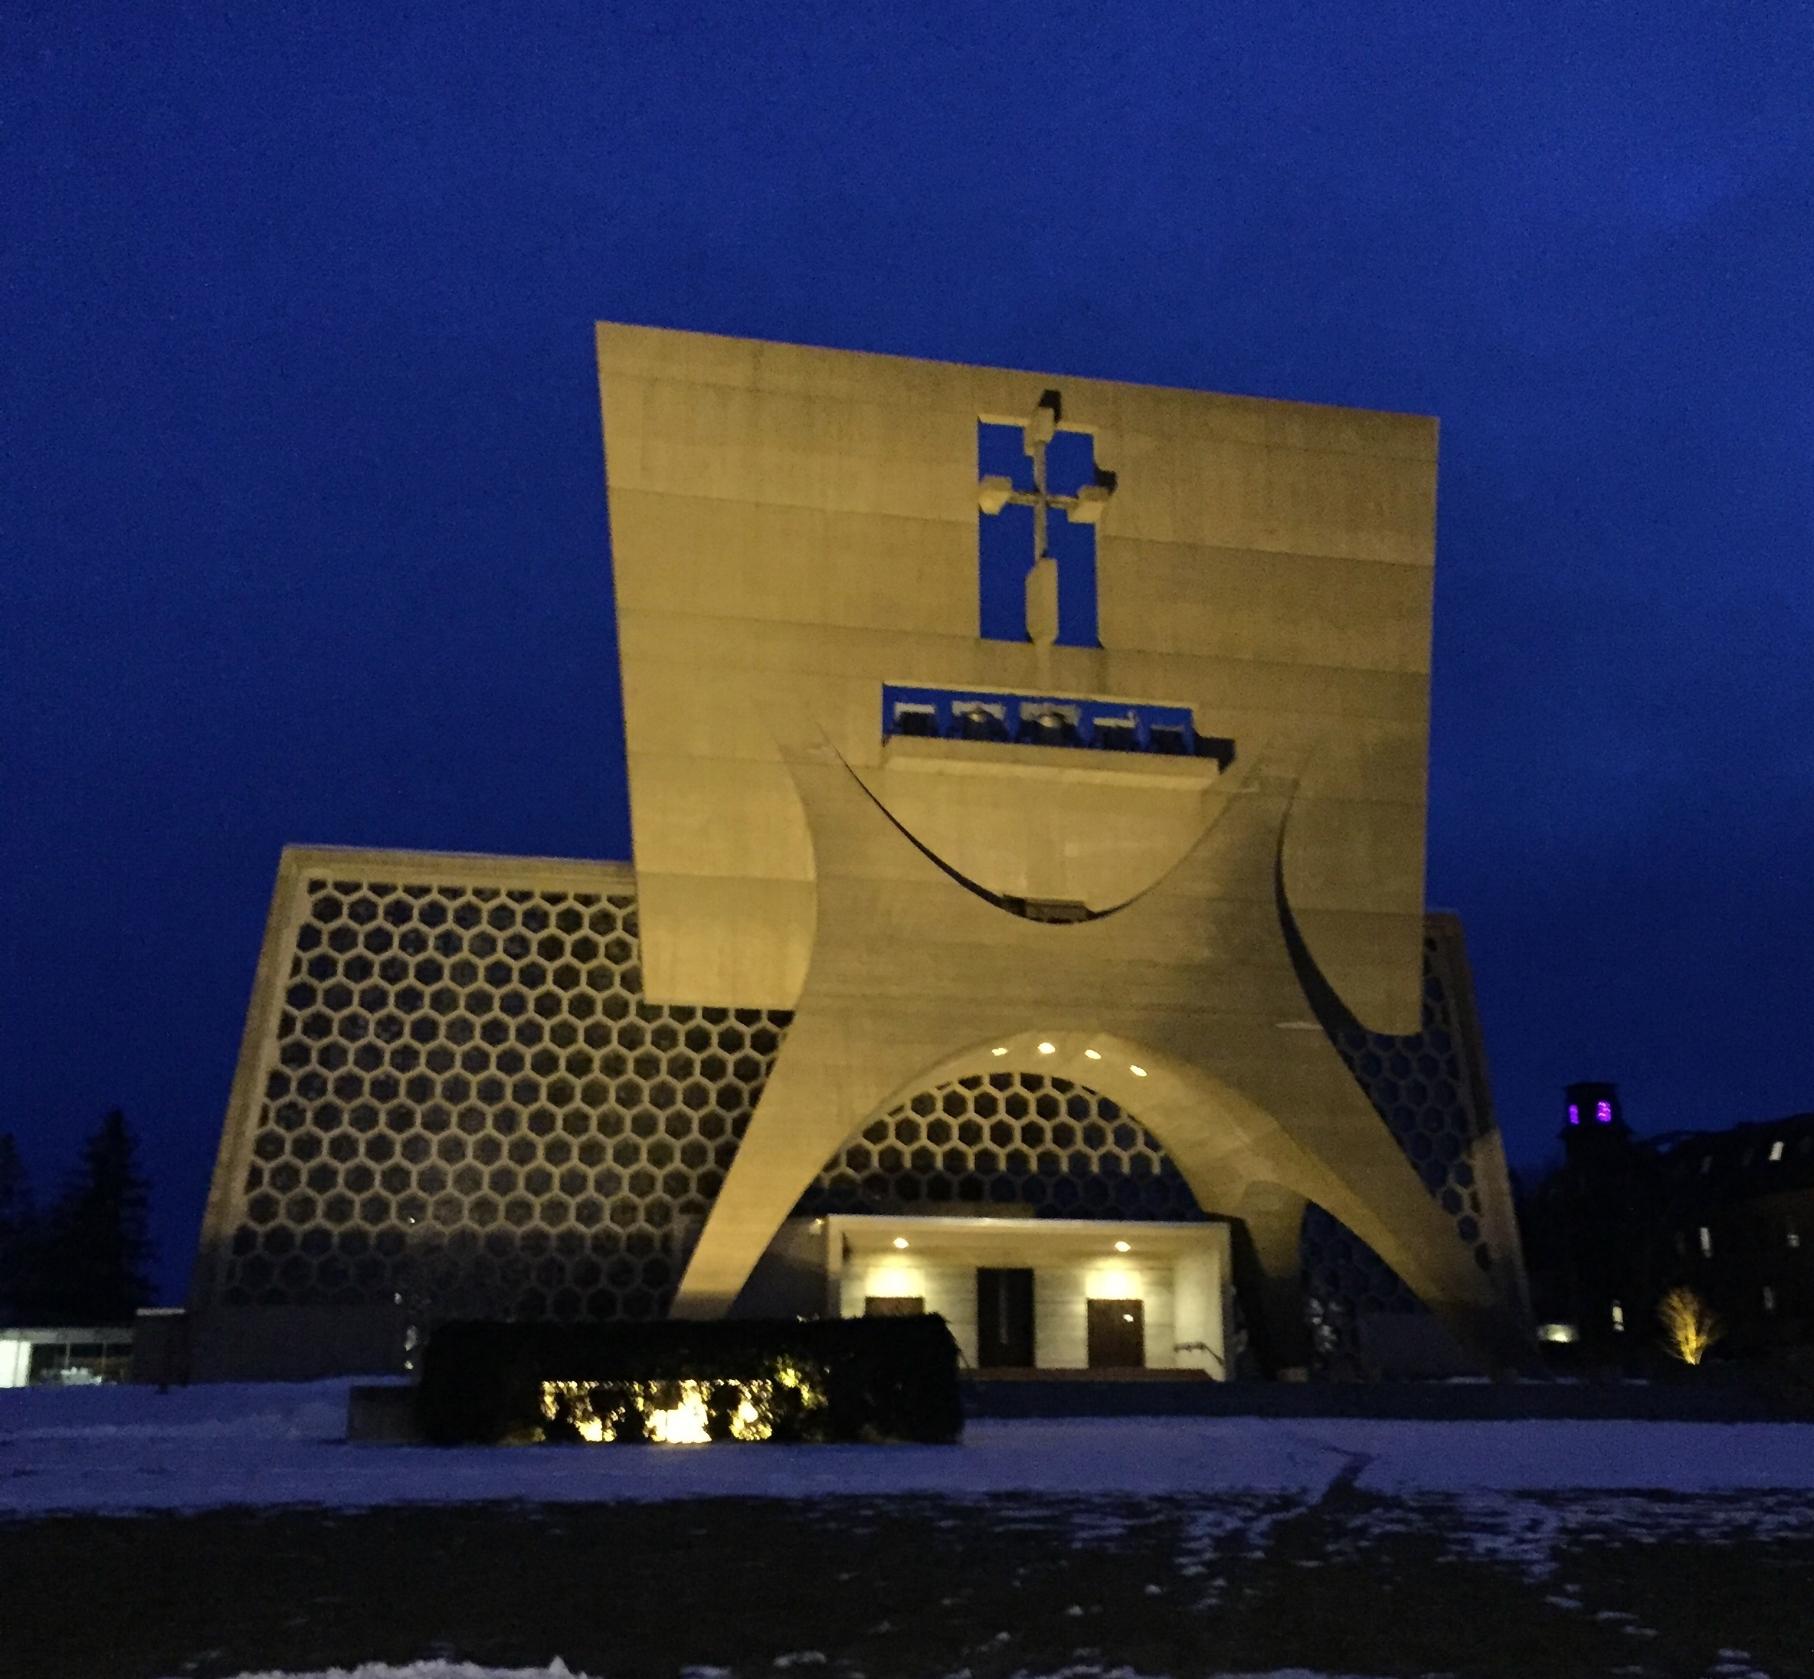 Saint John's Abbey Church. Designed by Marcel Breuer.